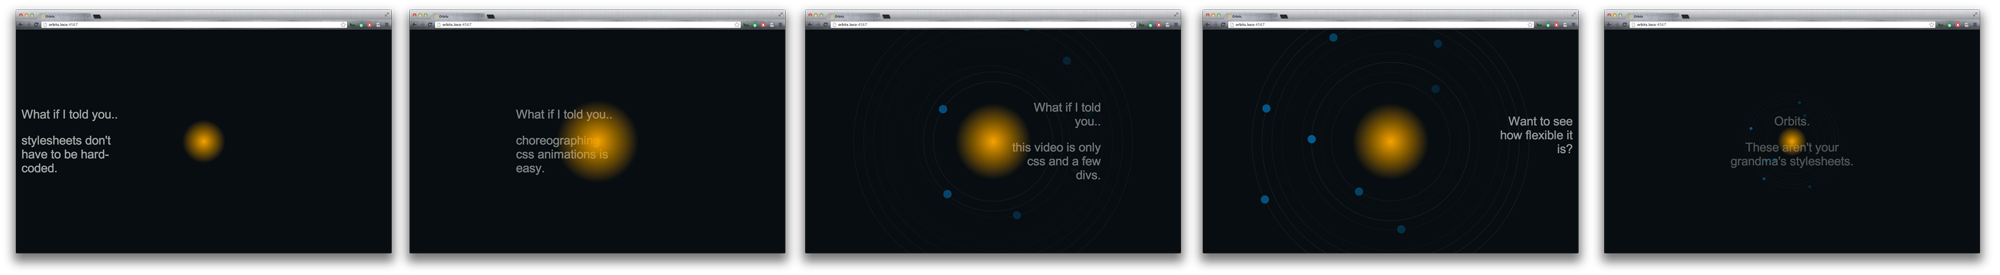 Orbits - choreograph css animations with sass - Matt Copeland